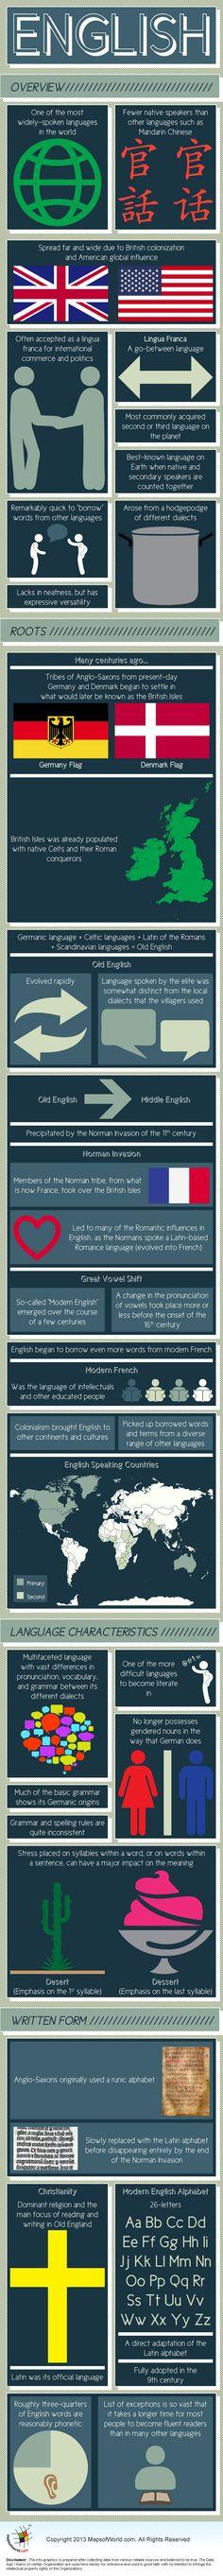 Infographic of English Language